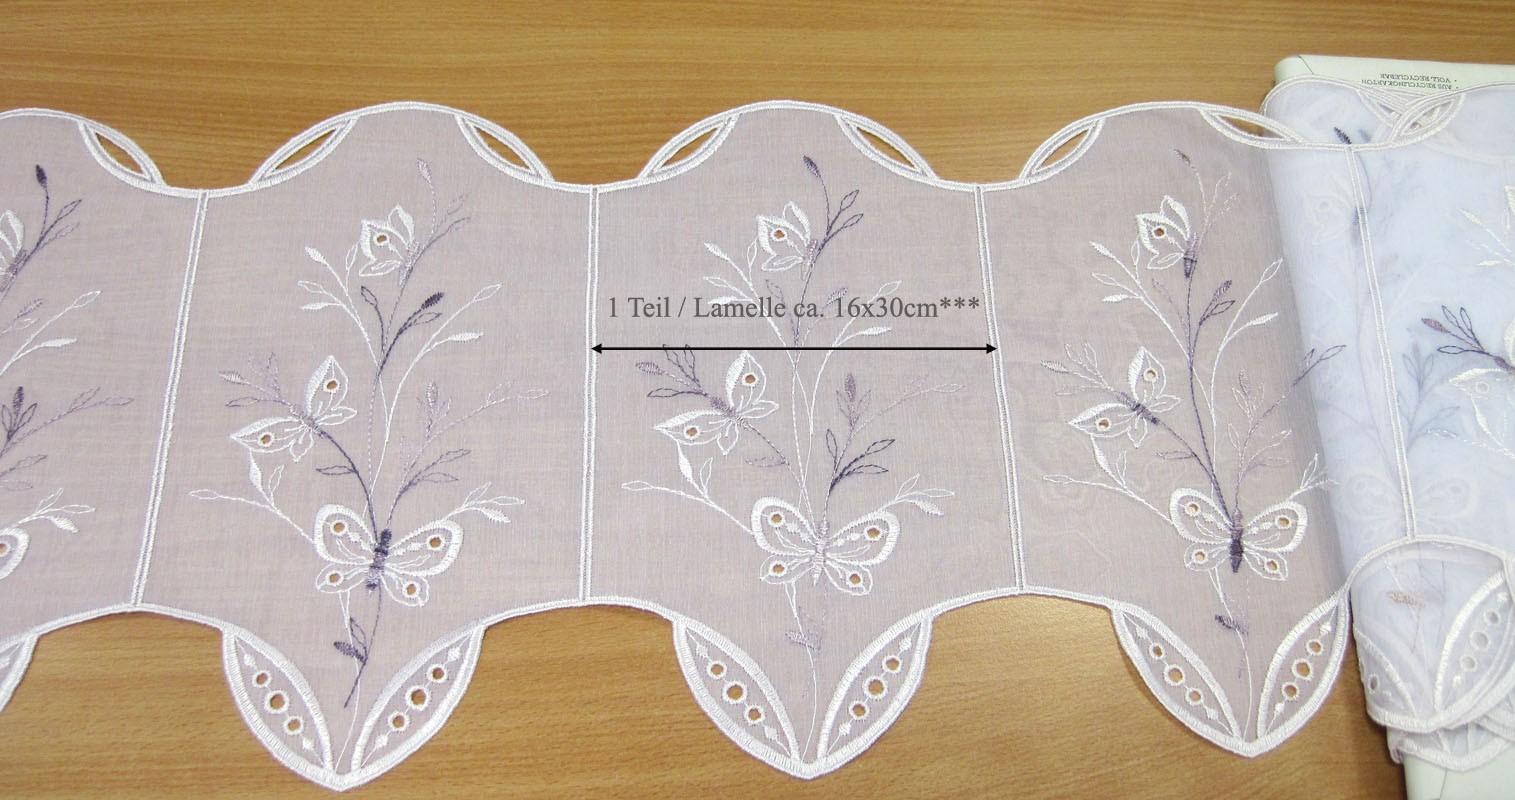 1 Teil / Lamelle Kurzgardine weiß - violett 16 x 30 cm B/H